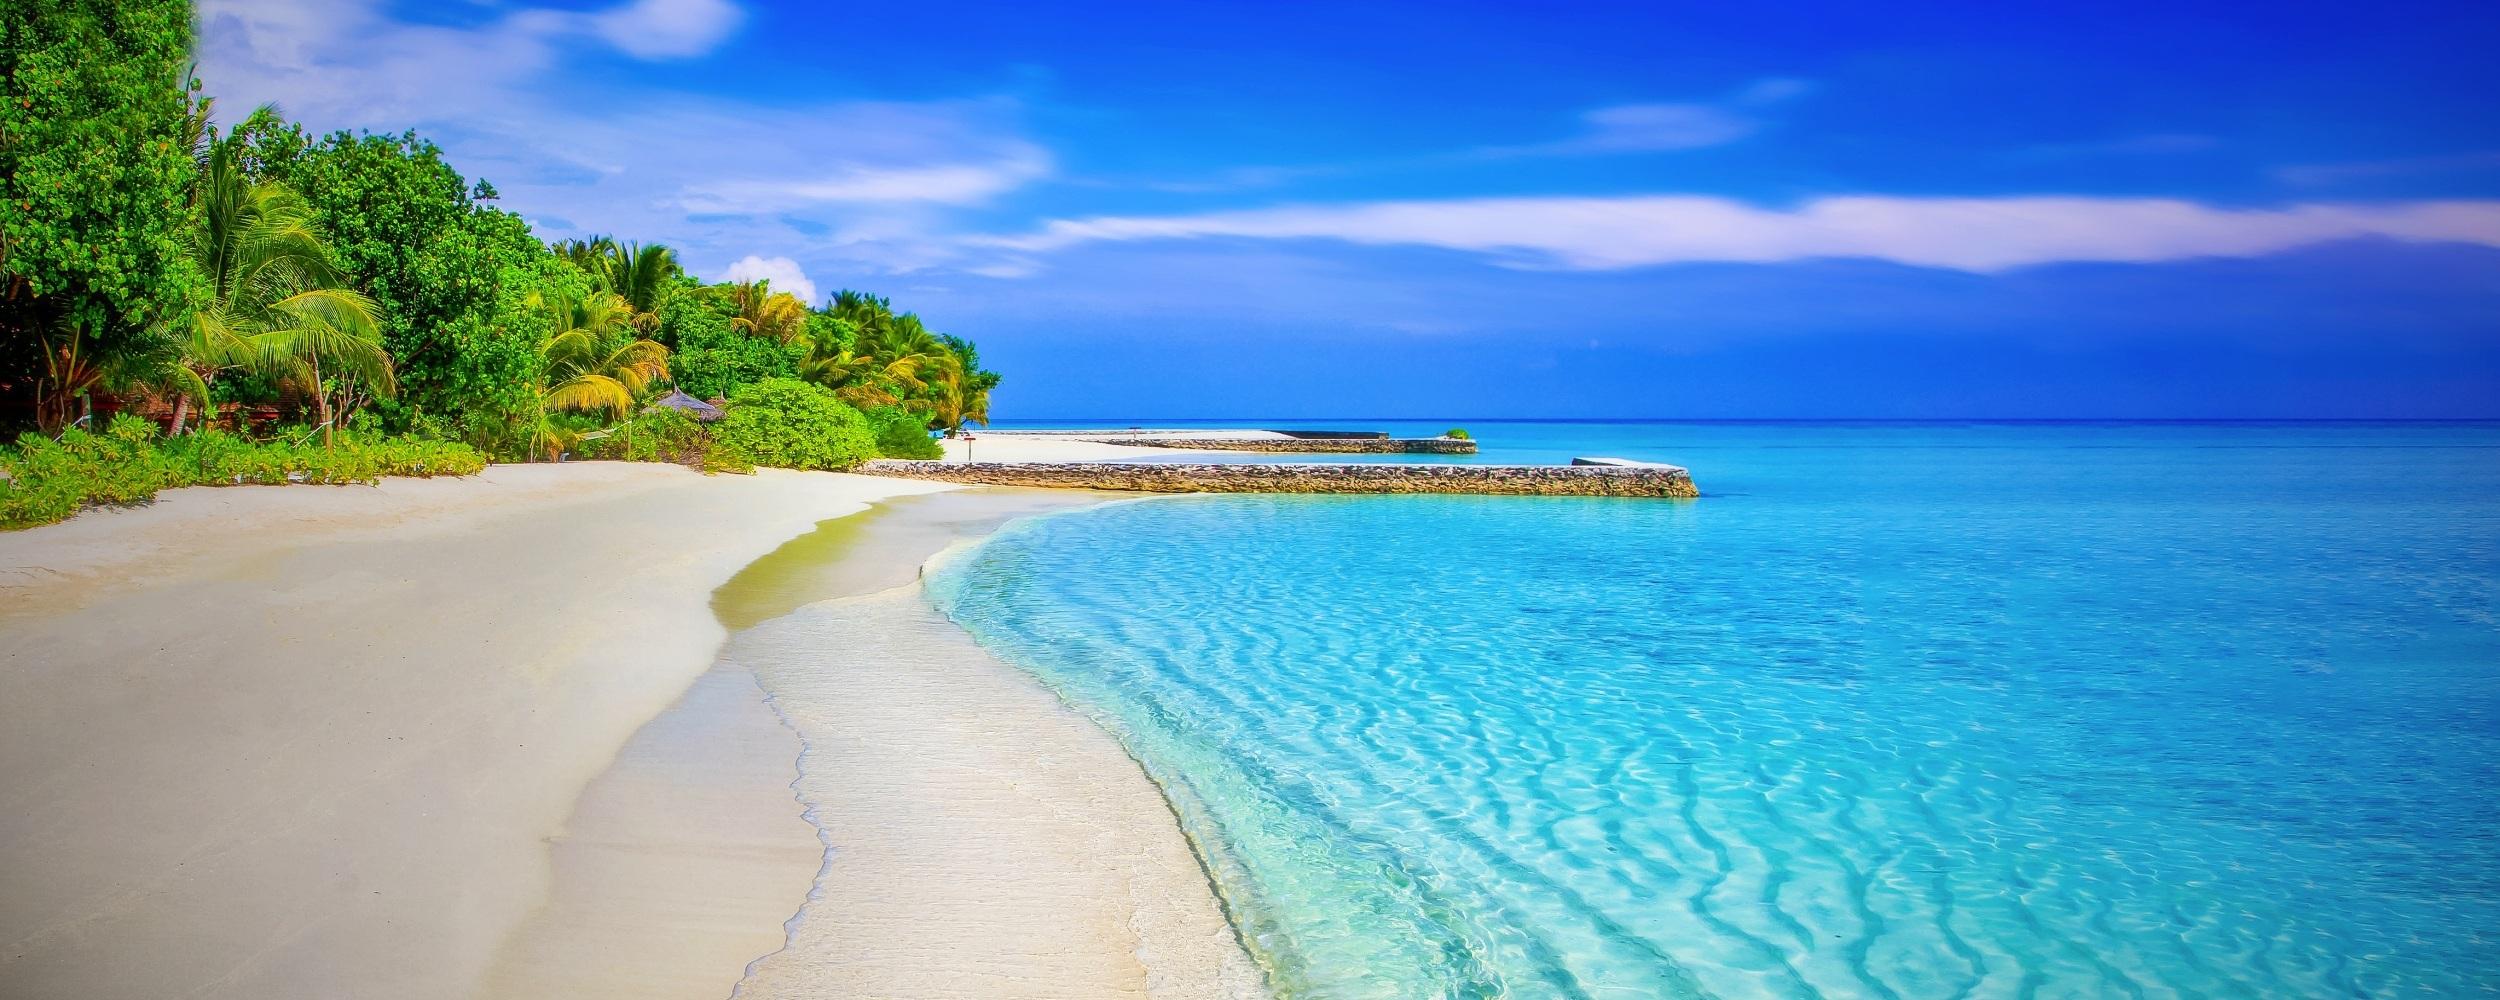 reasons to move to Florida, Florida living, moving to Florida, homes for sale n Deltona Florida